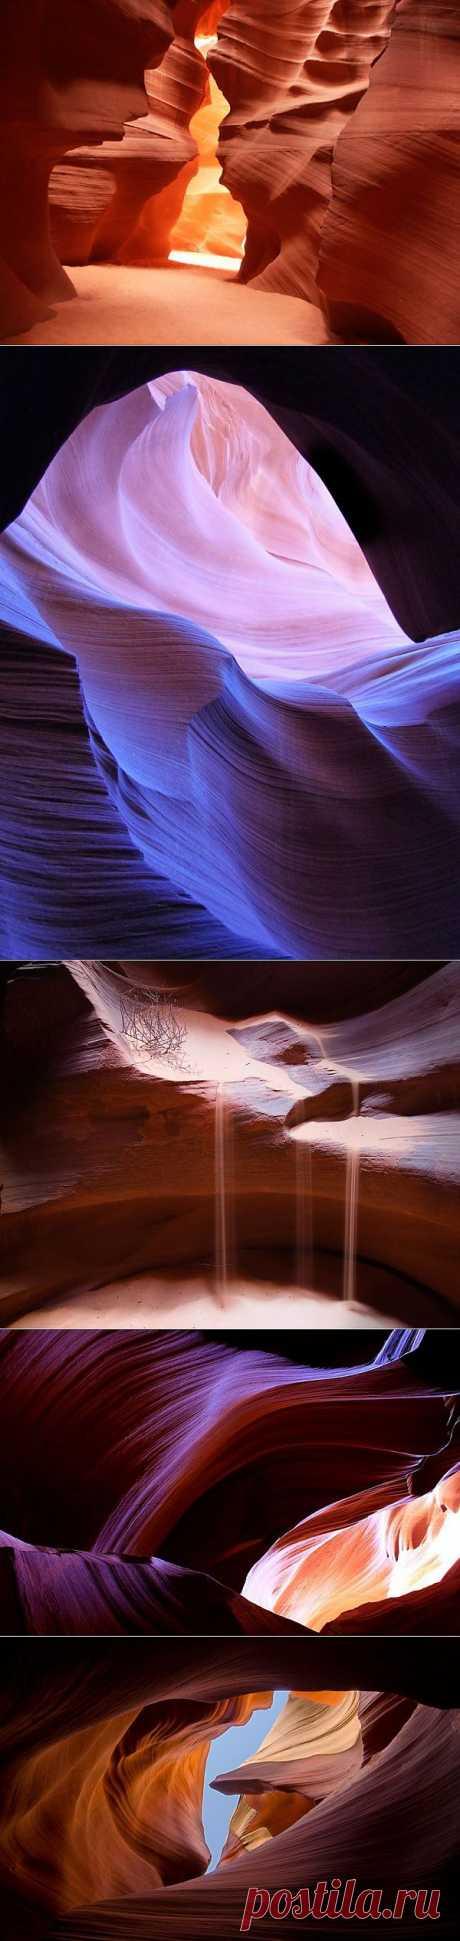 Неземная красота каньона Антилопы (26 фото)